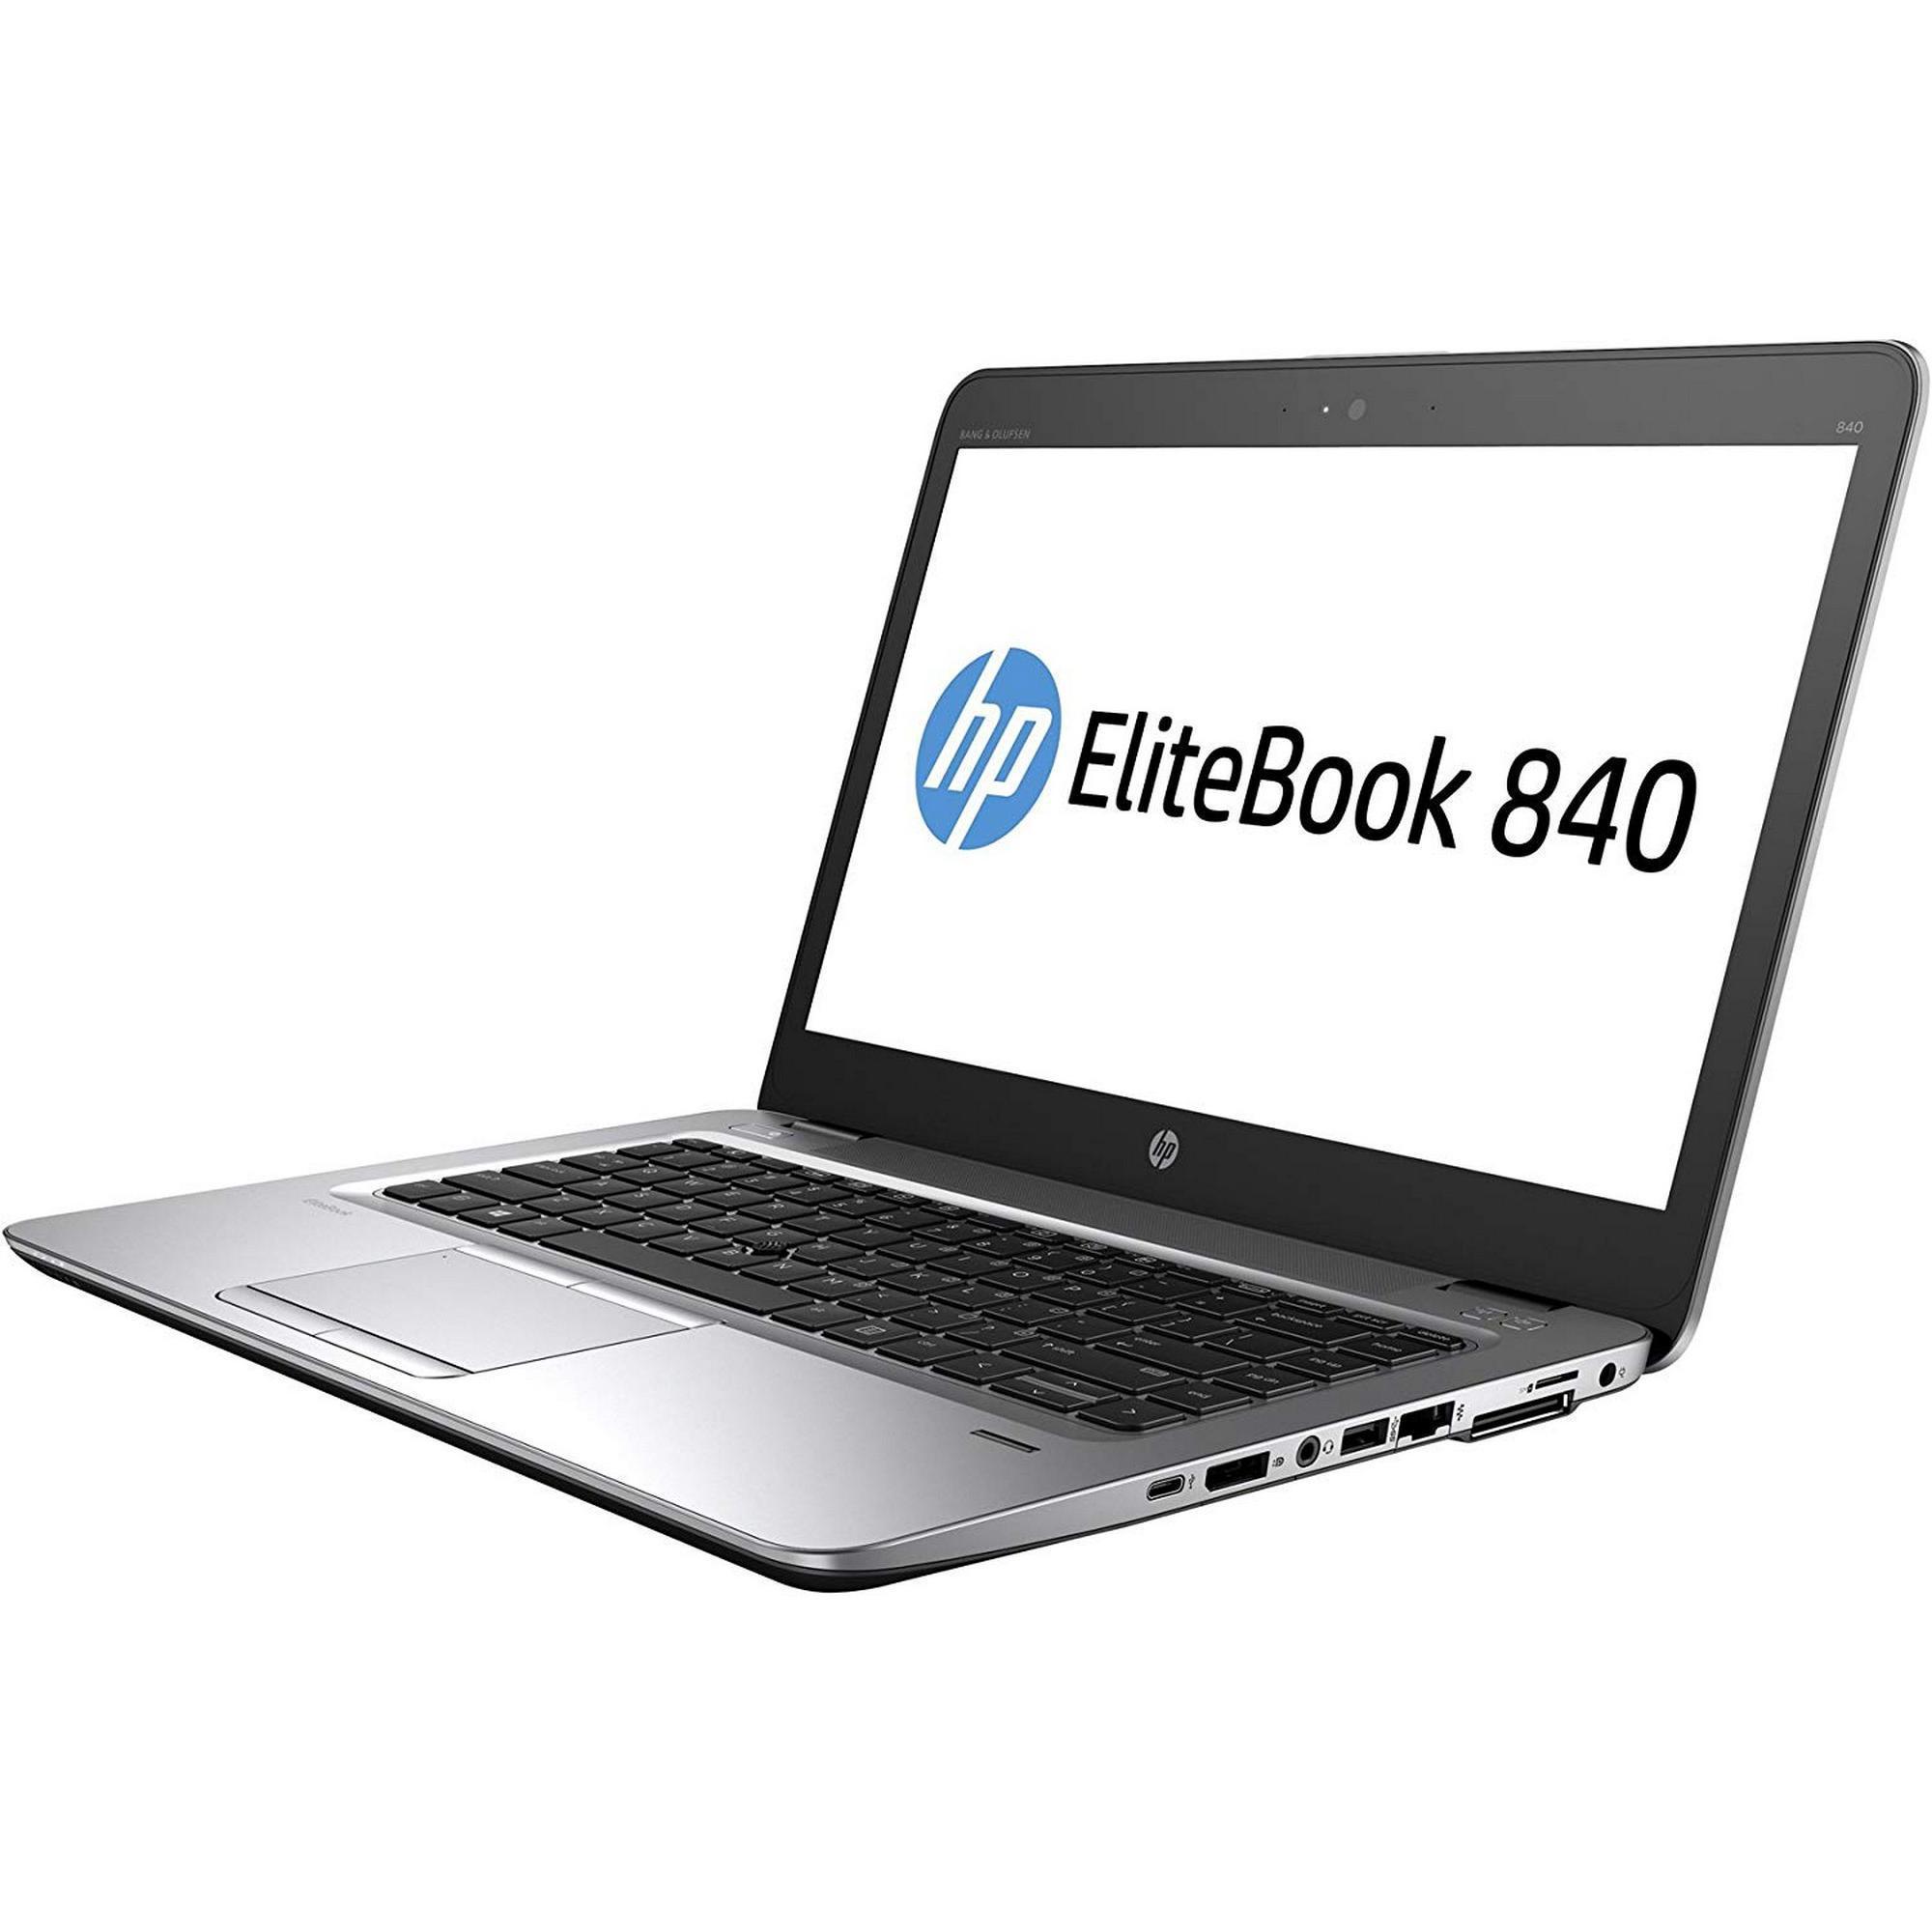 Hp EliteBook 840 G2 14-inch (2015) - Core i5-5300U - 8 GB - SSD 256 GB